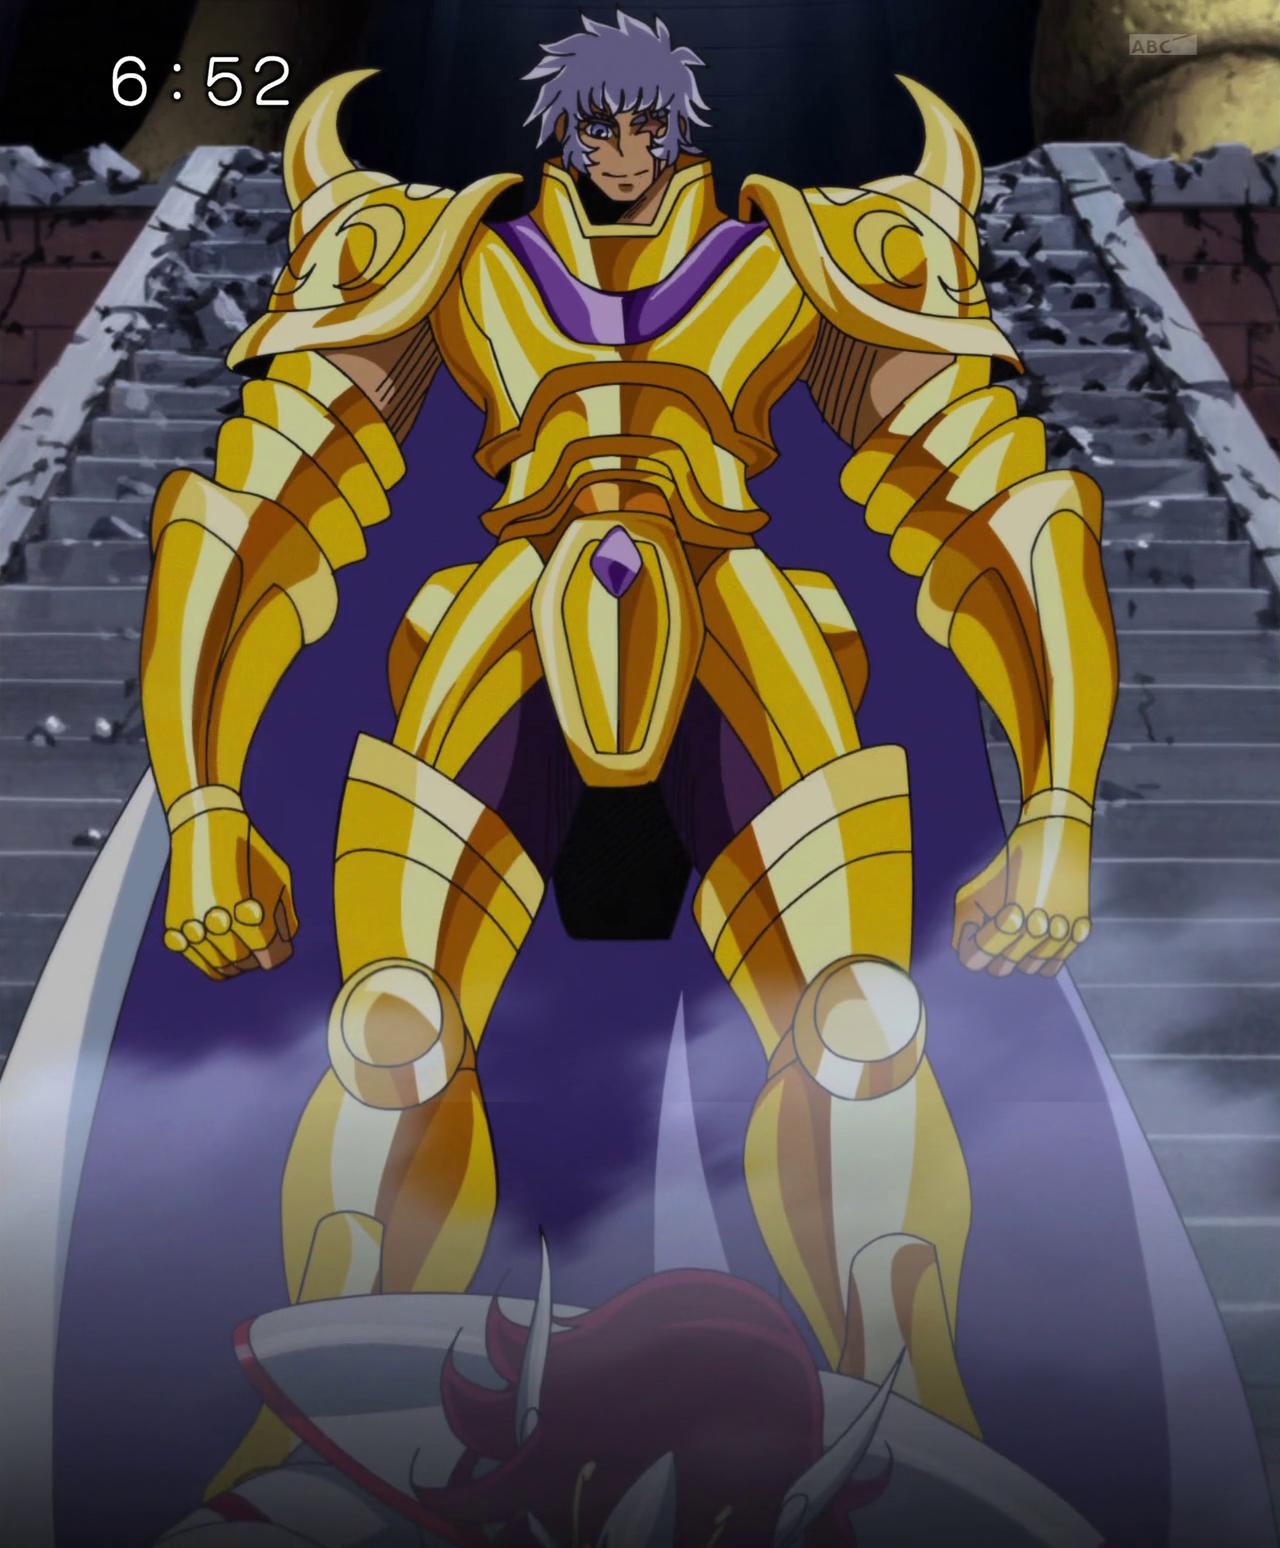 Saint Seiya (Caballeros del Zodiaco) Harbinger